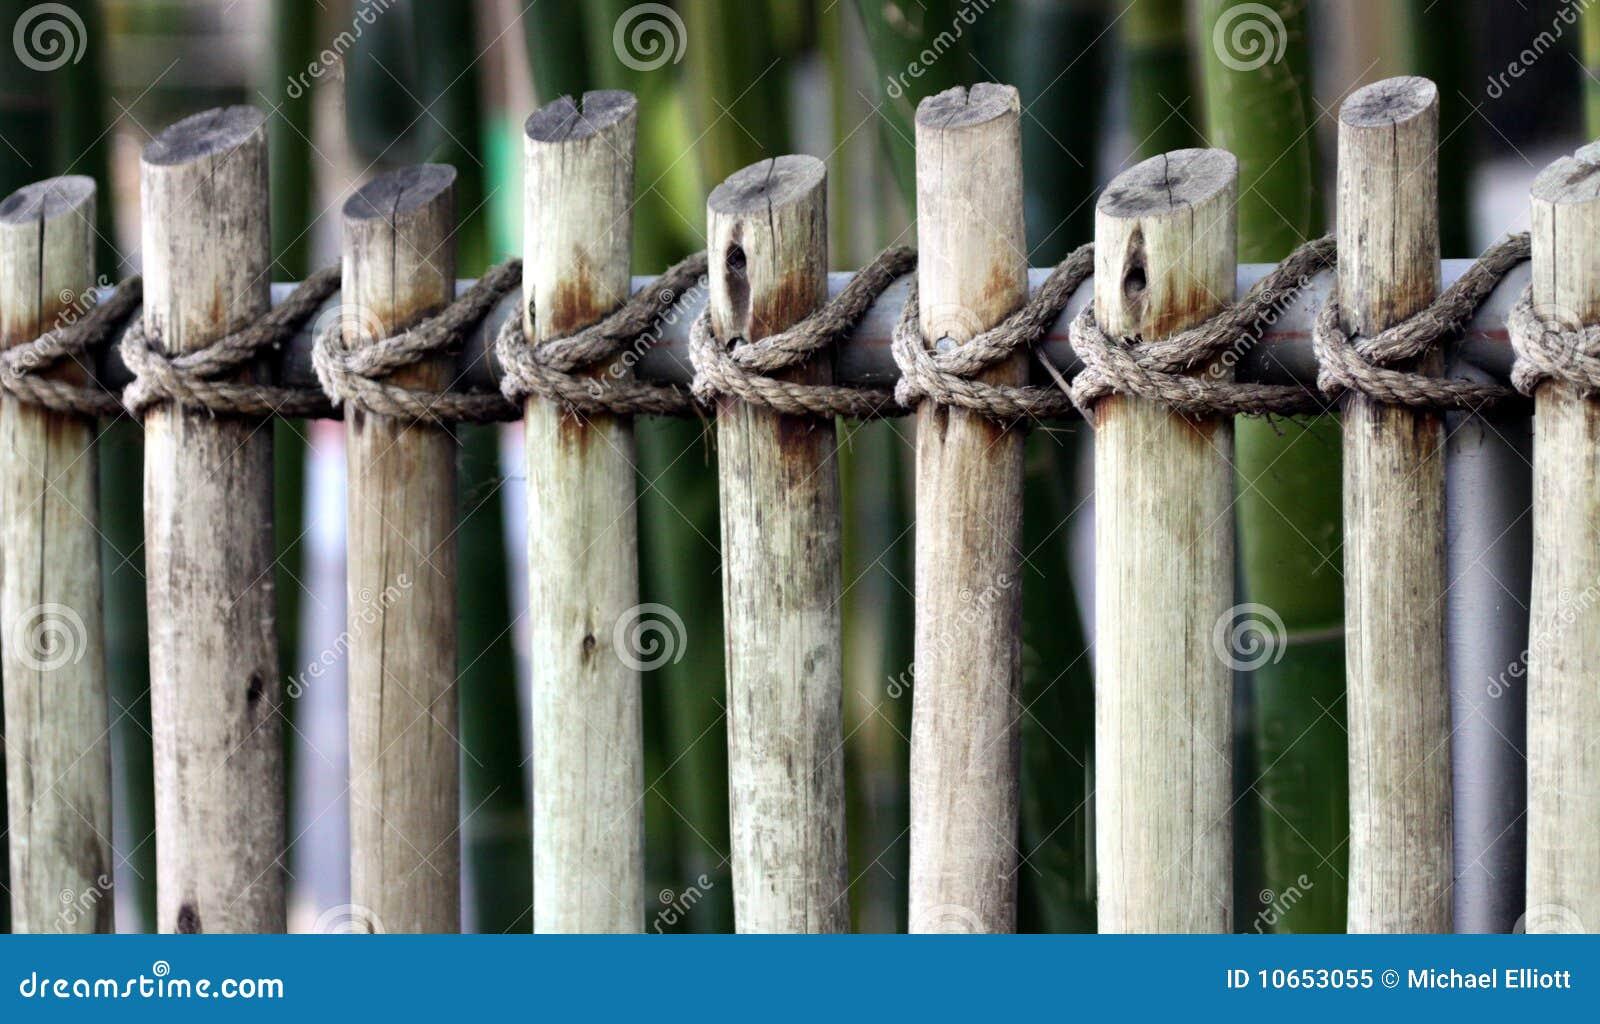 Garden gate plans - Primitive Fence Royalty Free Stock Photo Image 10653055